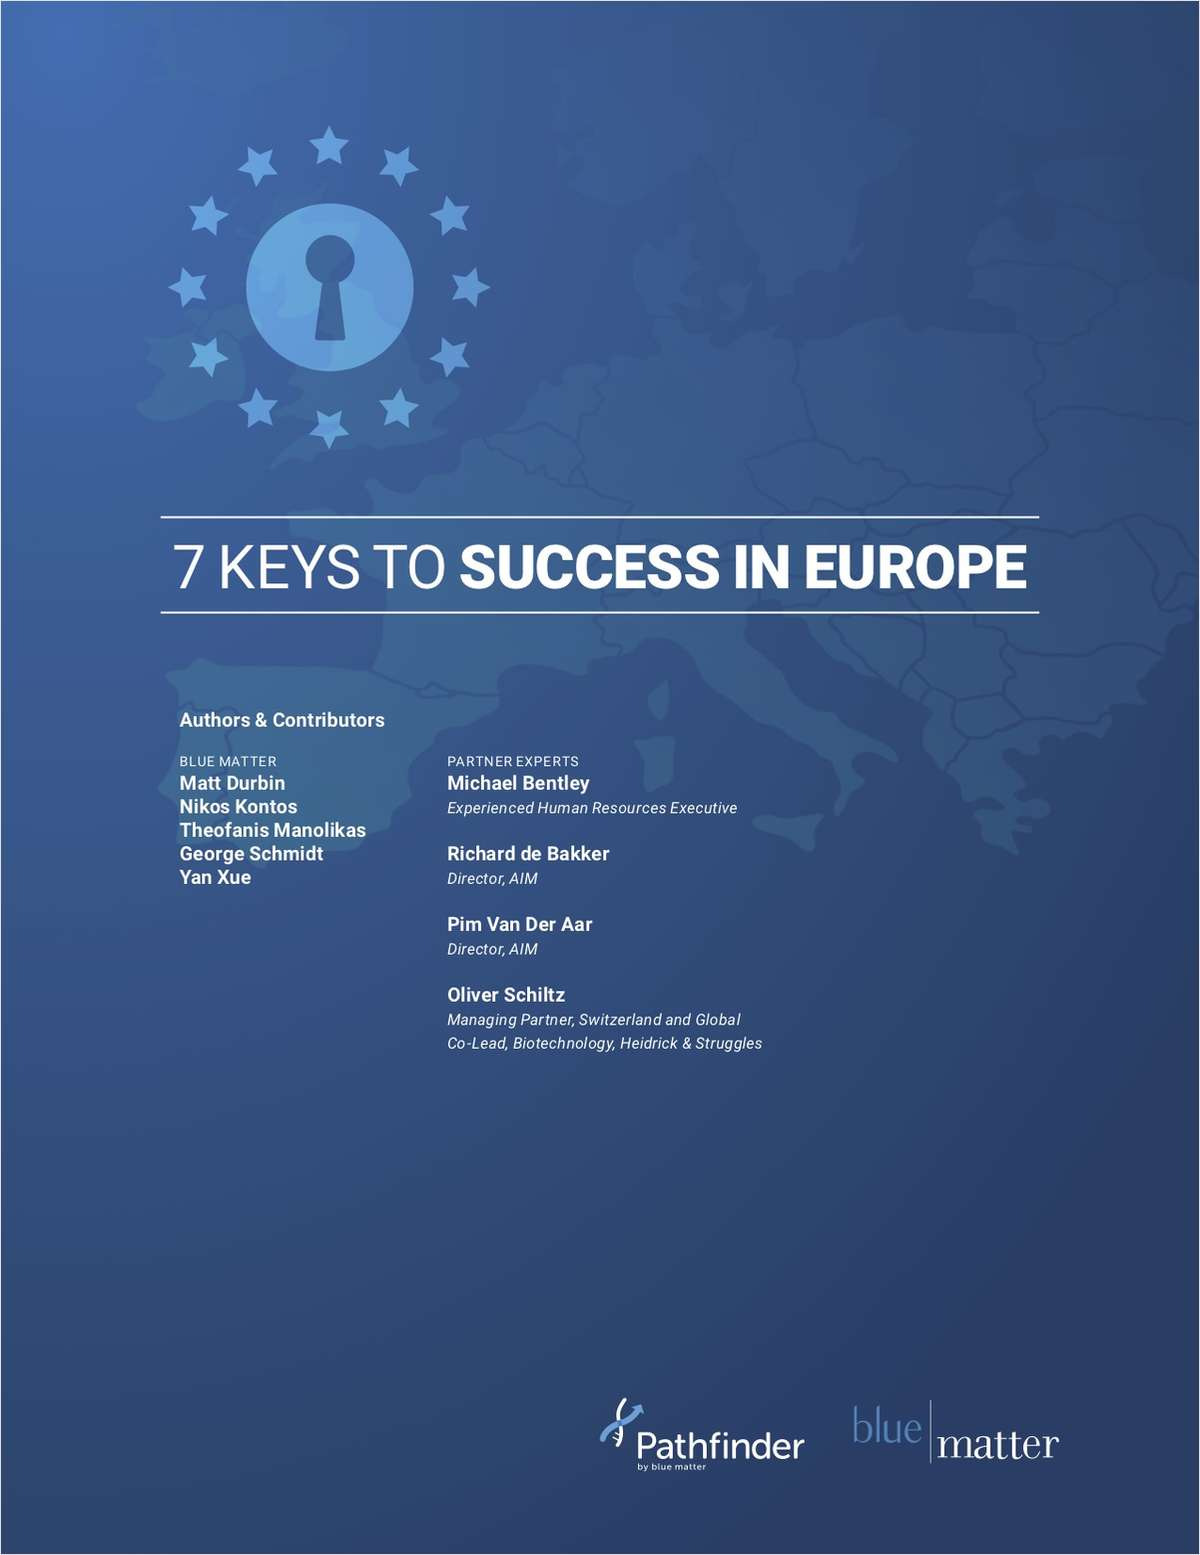 7 Keys to Success in Europe